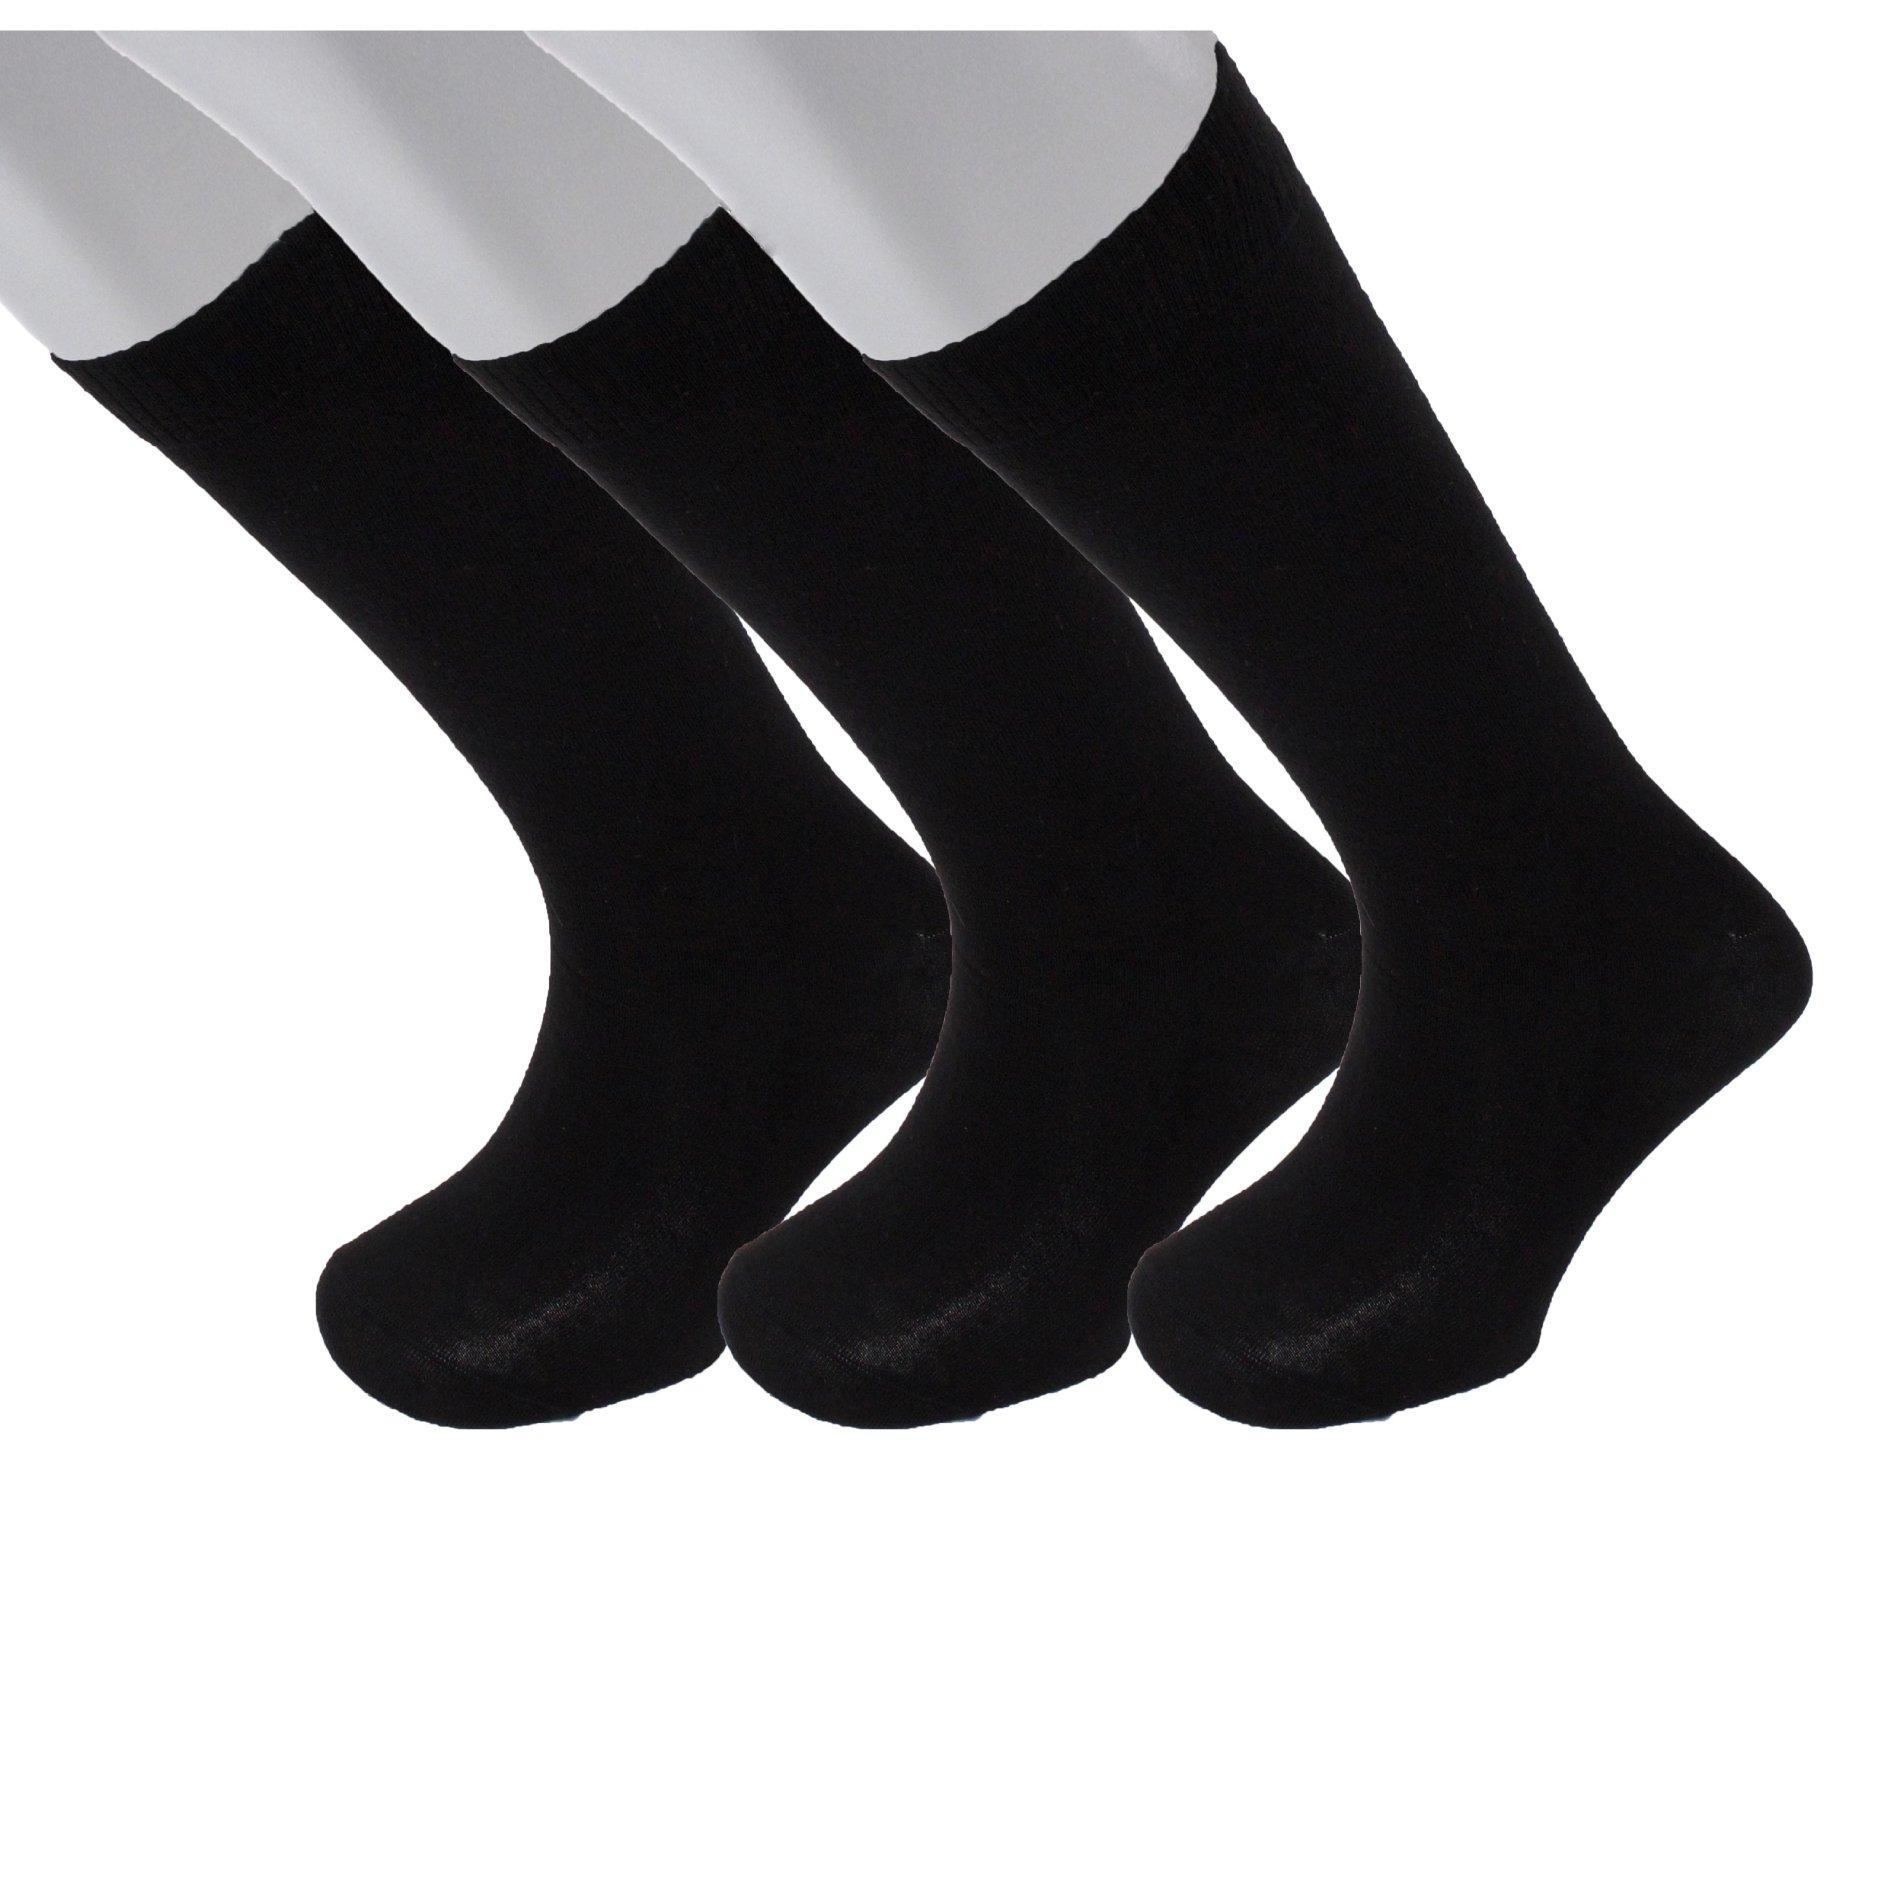 Diabetic Socks   Mens Black OTC 3 Pack   Seamless Toe   Non-Binding Top   Sock Size 10-13   Improve Foot Health Comfort Circulation for Diabetes, Edema, Flight Travel, Swollen Feet, Neuropathy